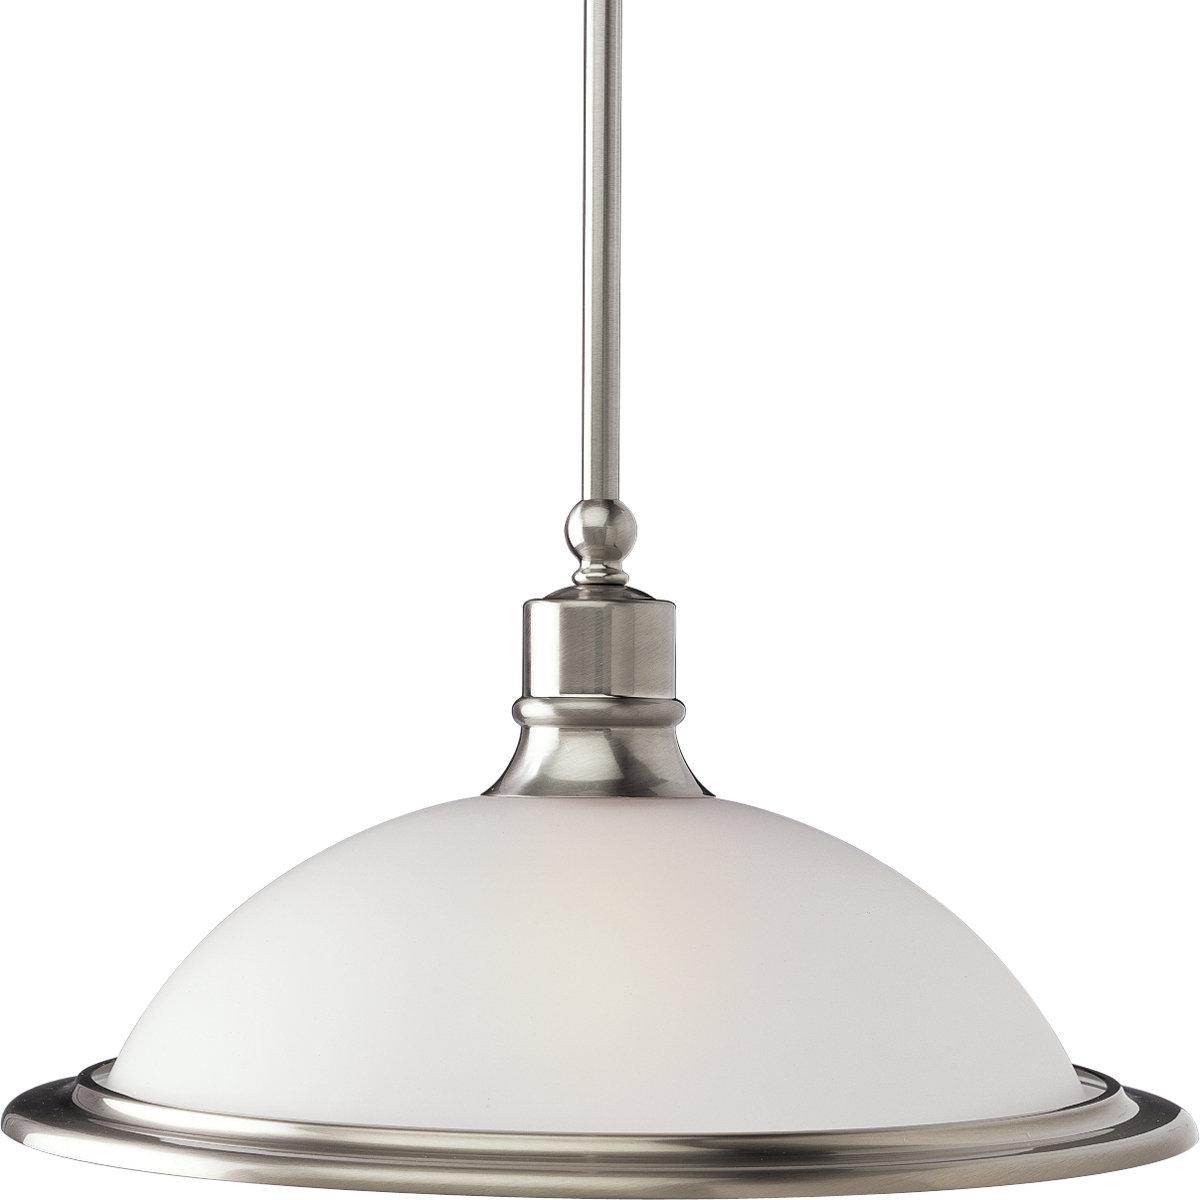 Famous Vangorder 1 Light Dome Pendant In Abernathy 1 Light Dome Pendants (View 13 of 25)